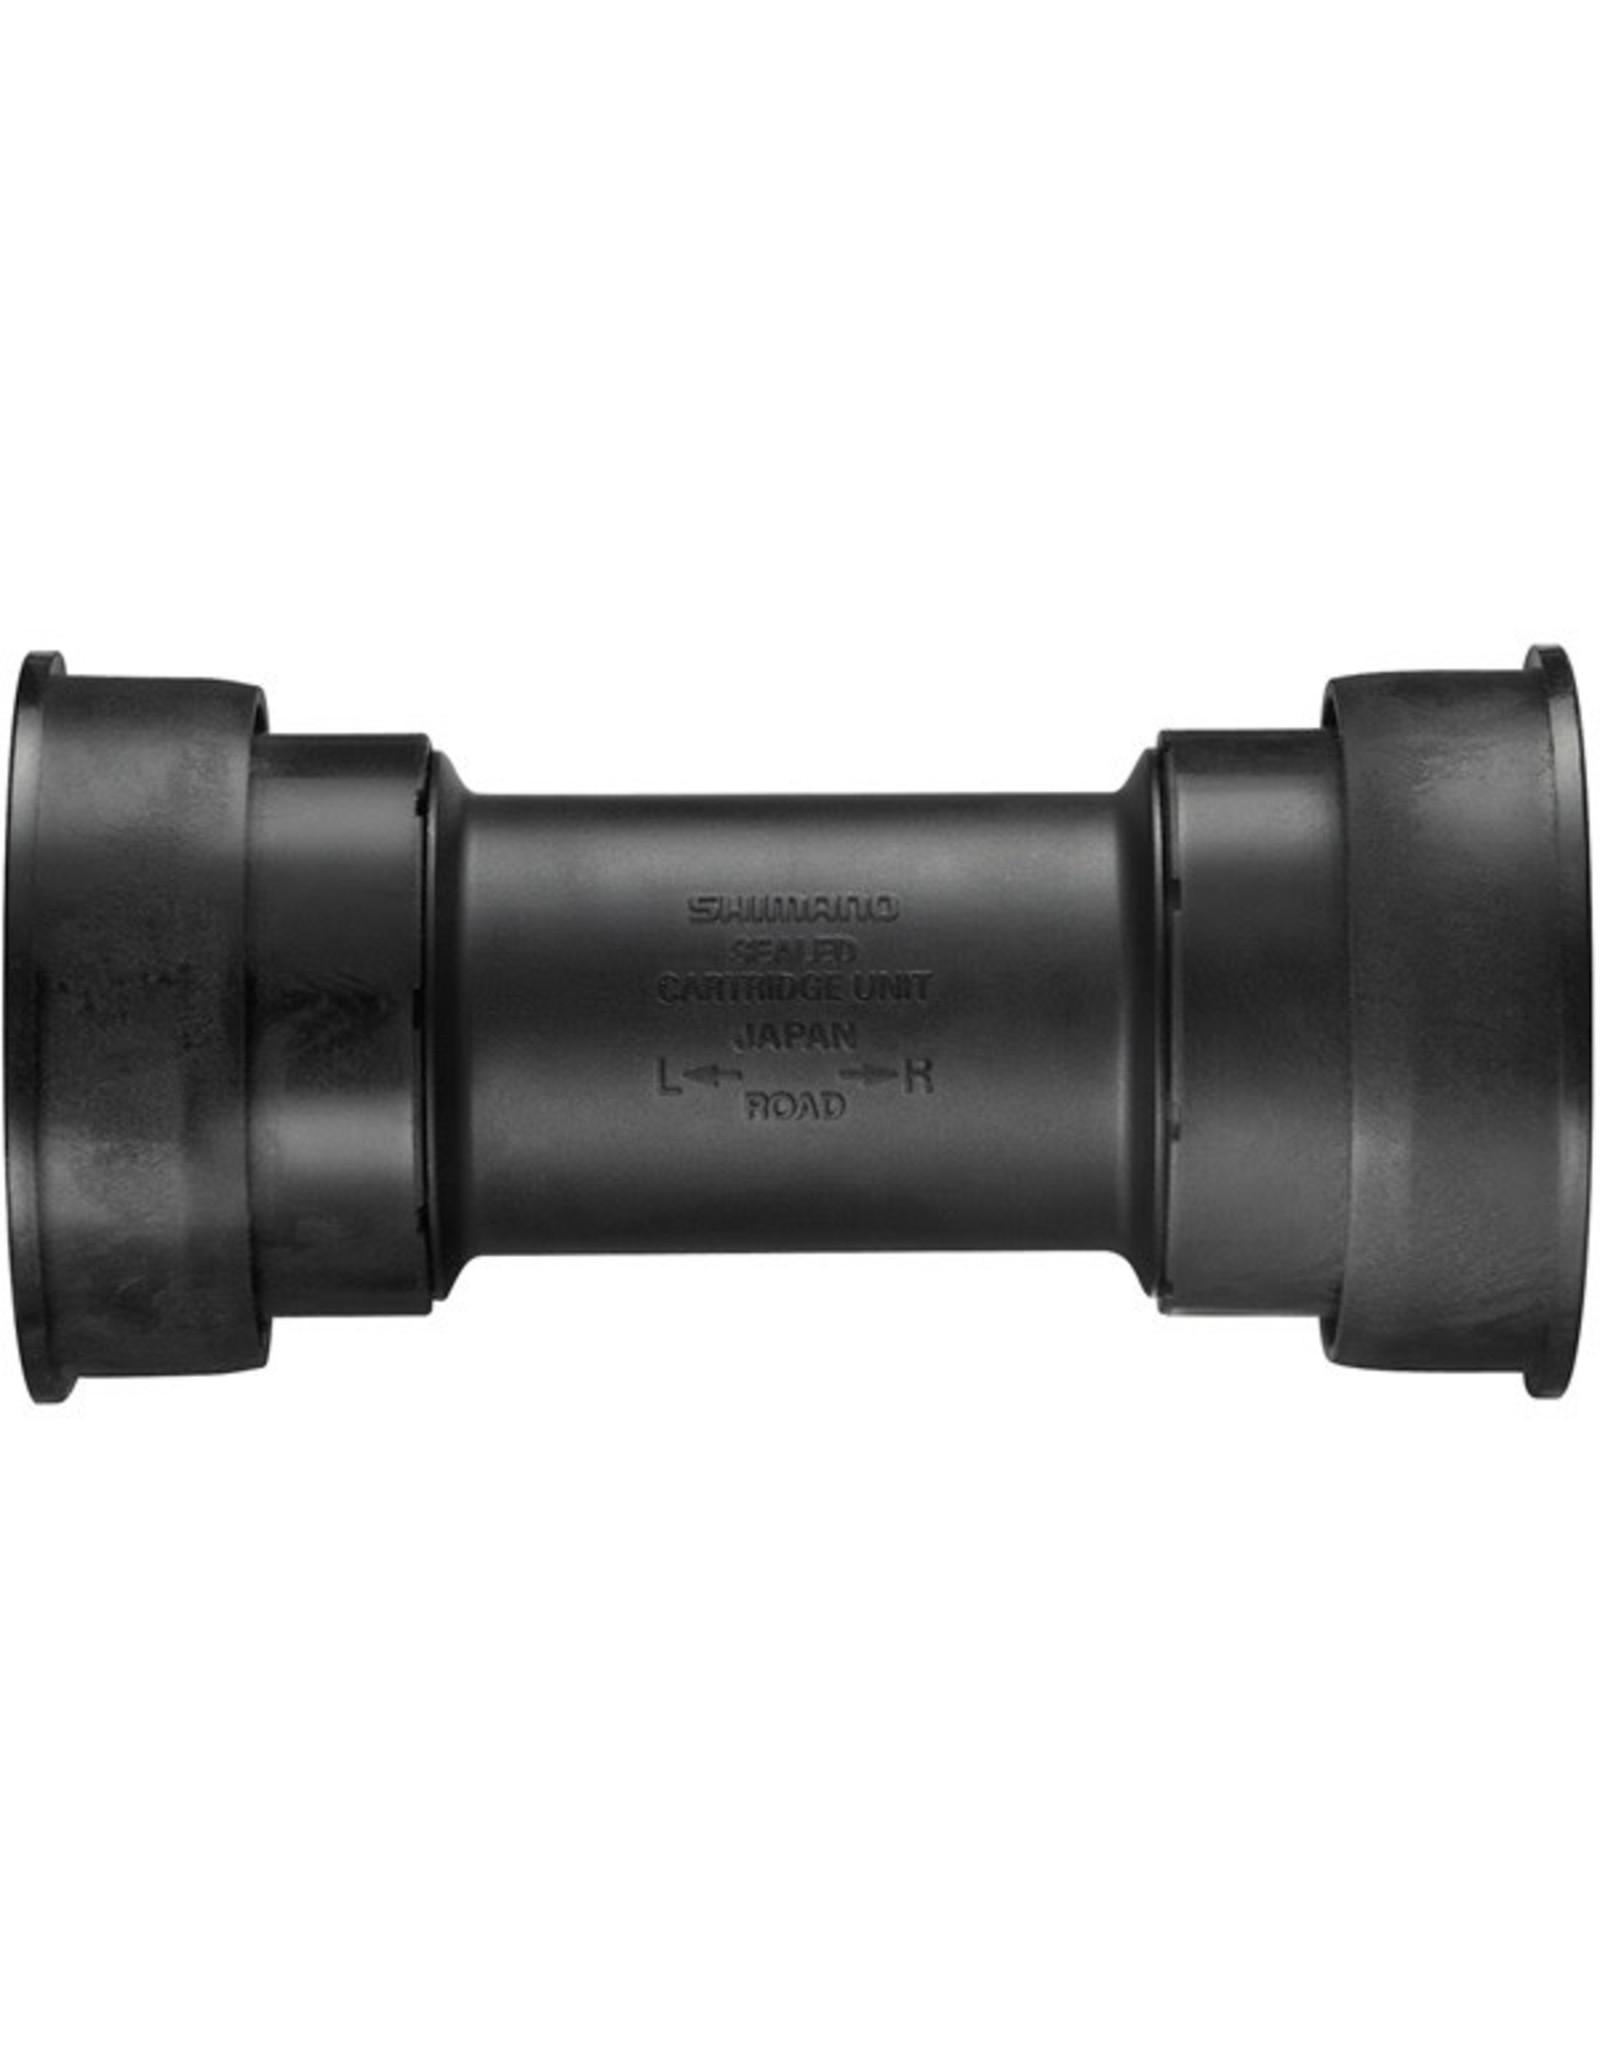 Shimano Bottom Bracket Road Press Fit BB92 86.5 41